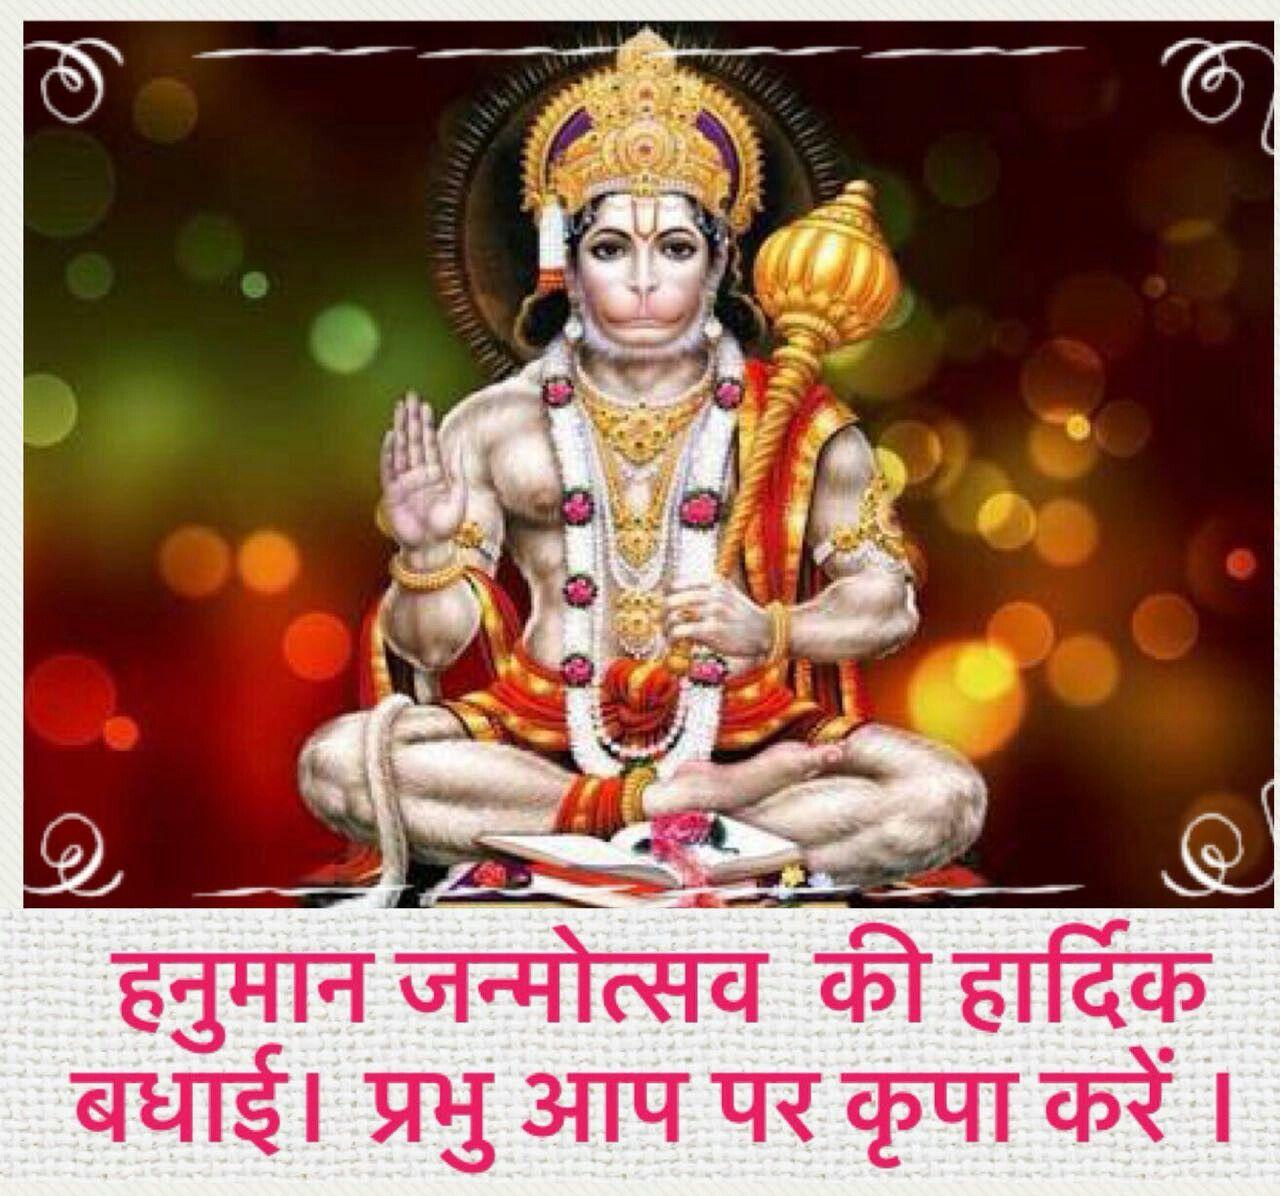 Hanuman image by sr mehta on festivals hanuman